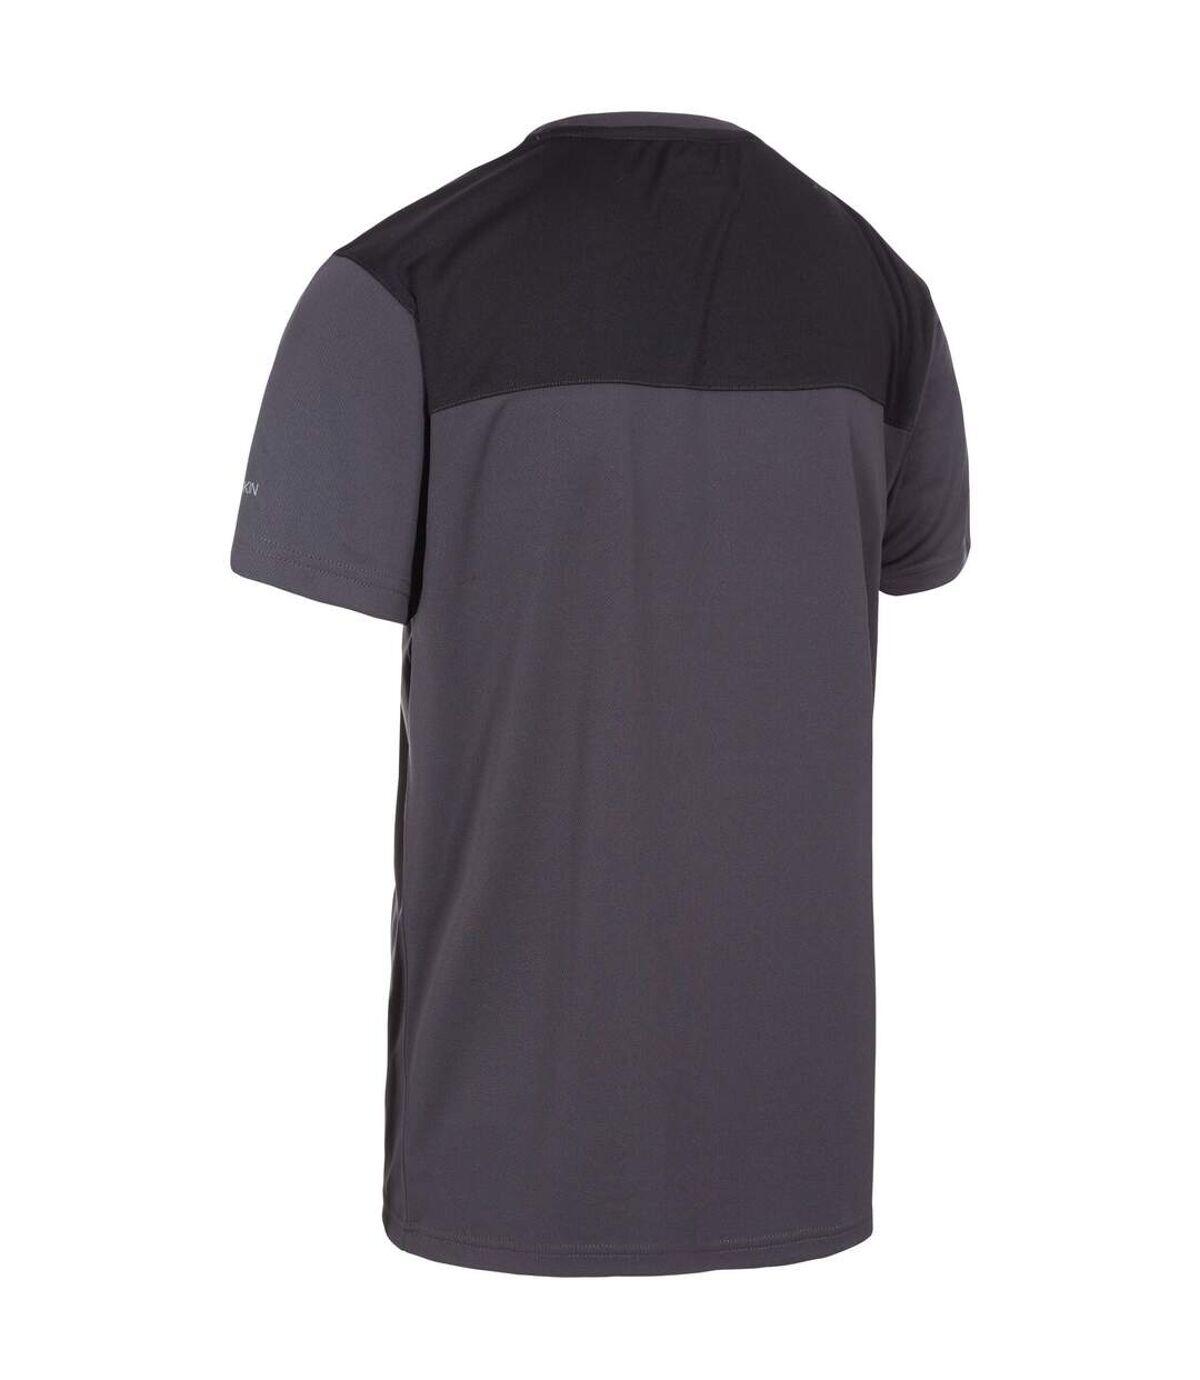 Trespass - T-shirt de sport JACOB - Homme (Gris foncé) - UTTP4999